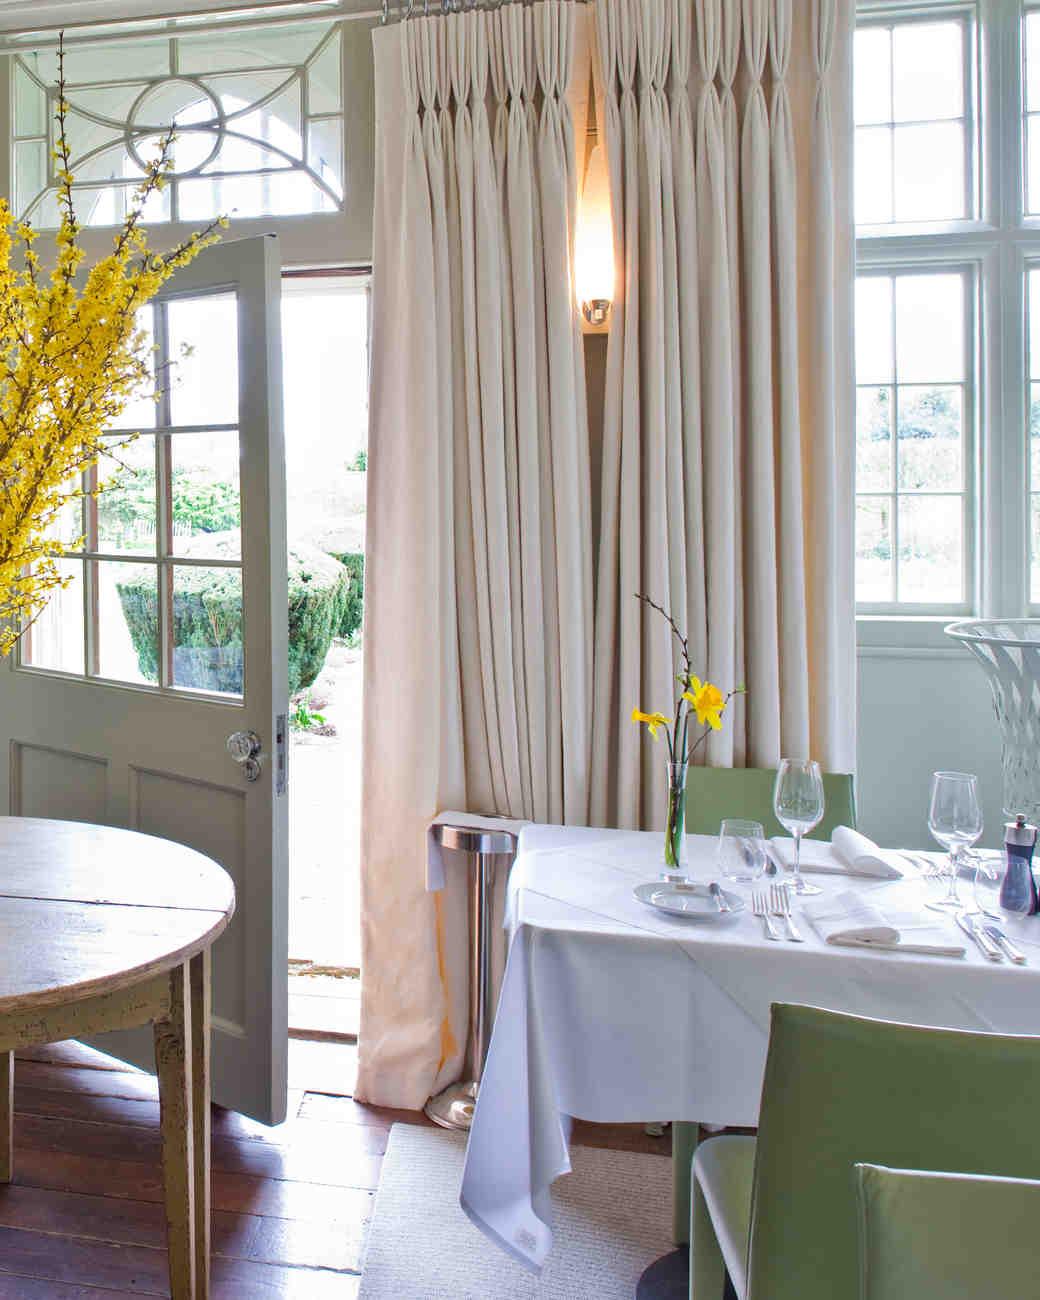 barnsley-house-restaurant-mwd1011.jpg